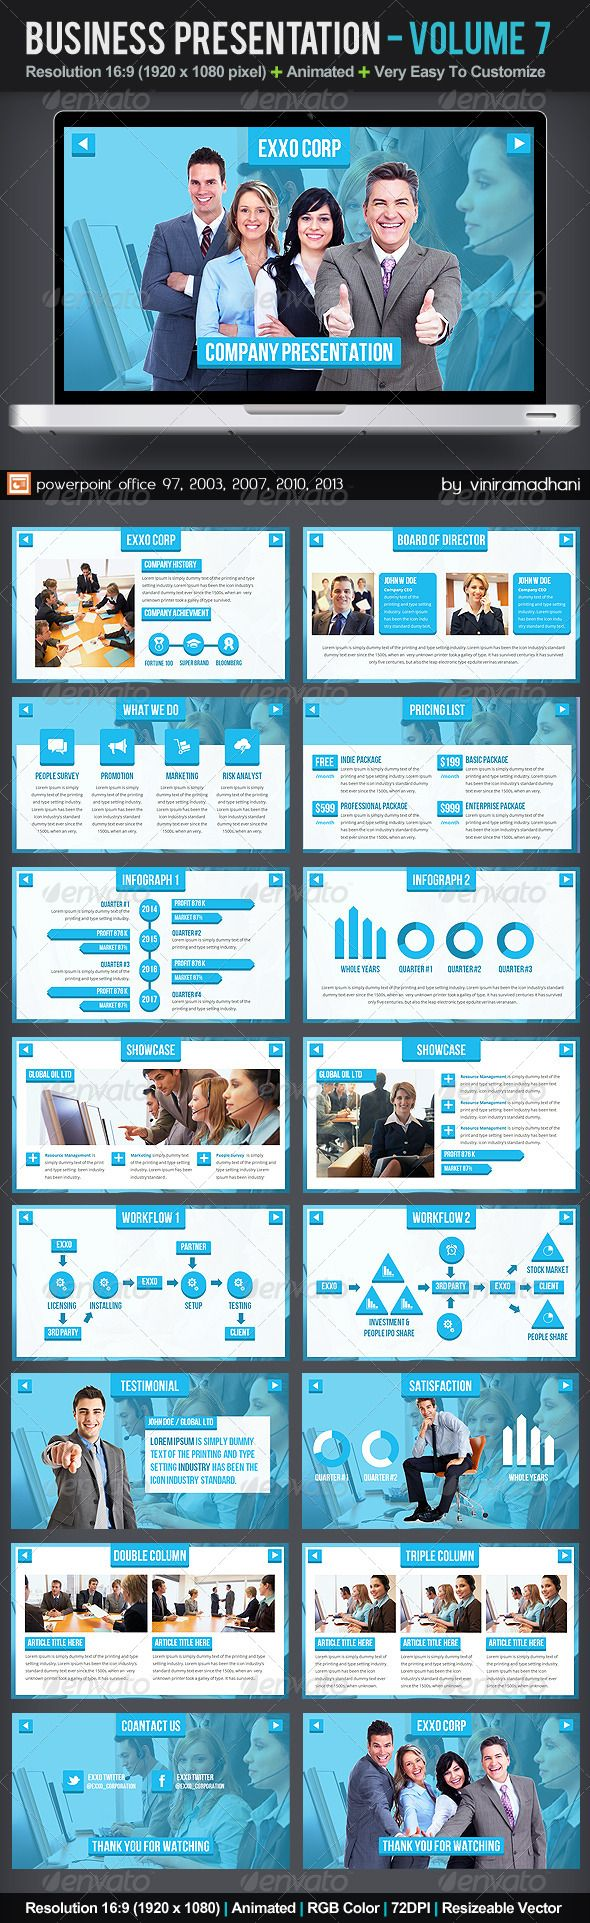 Business Presentation | Volume 7  #GraphicRiver         Specs  :   microsoft office powerpoint 97, 2003, 2007, 2010, 2013